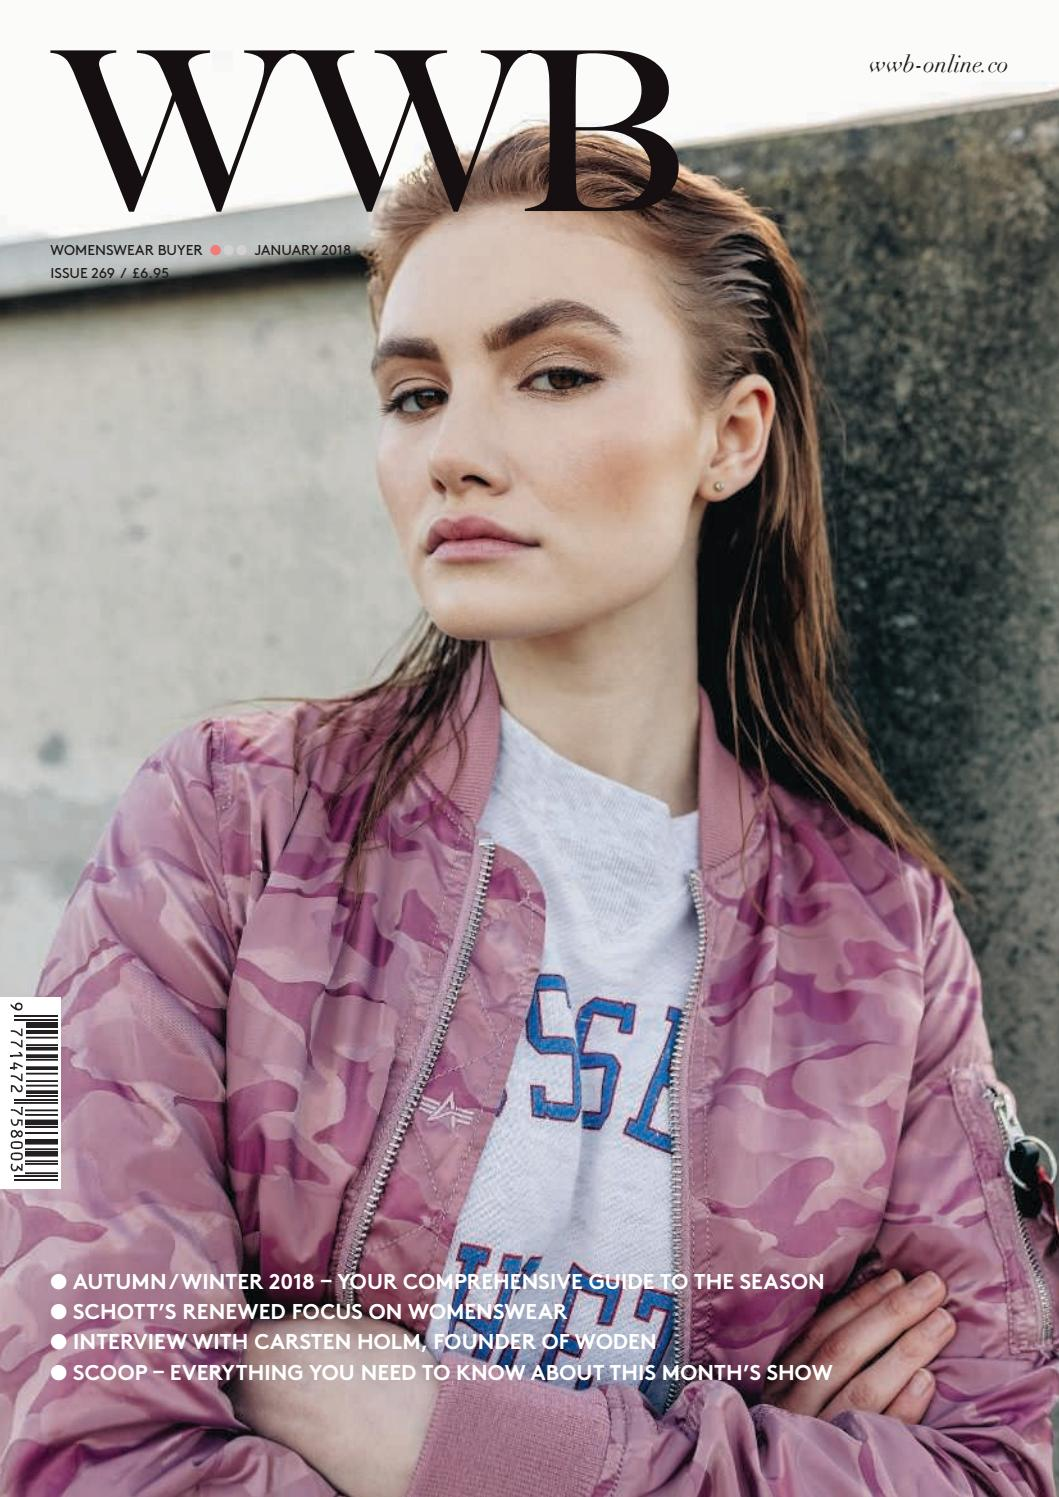 WWB MAGAZINE JANUARY 2018 ISSUE 269 by fashion buyers Ltd